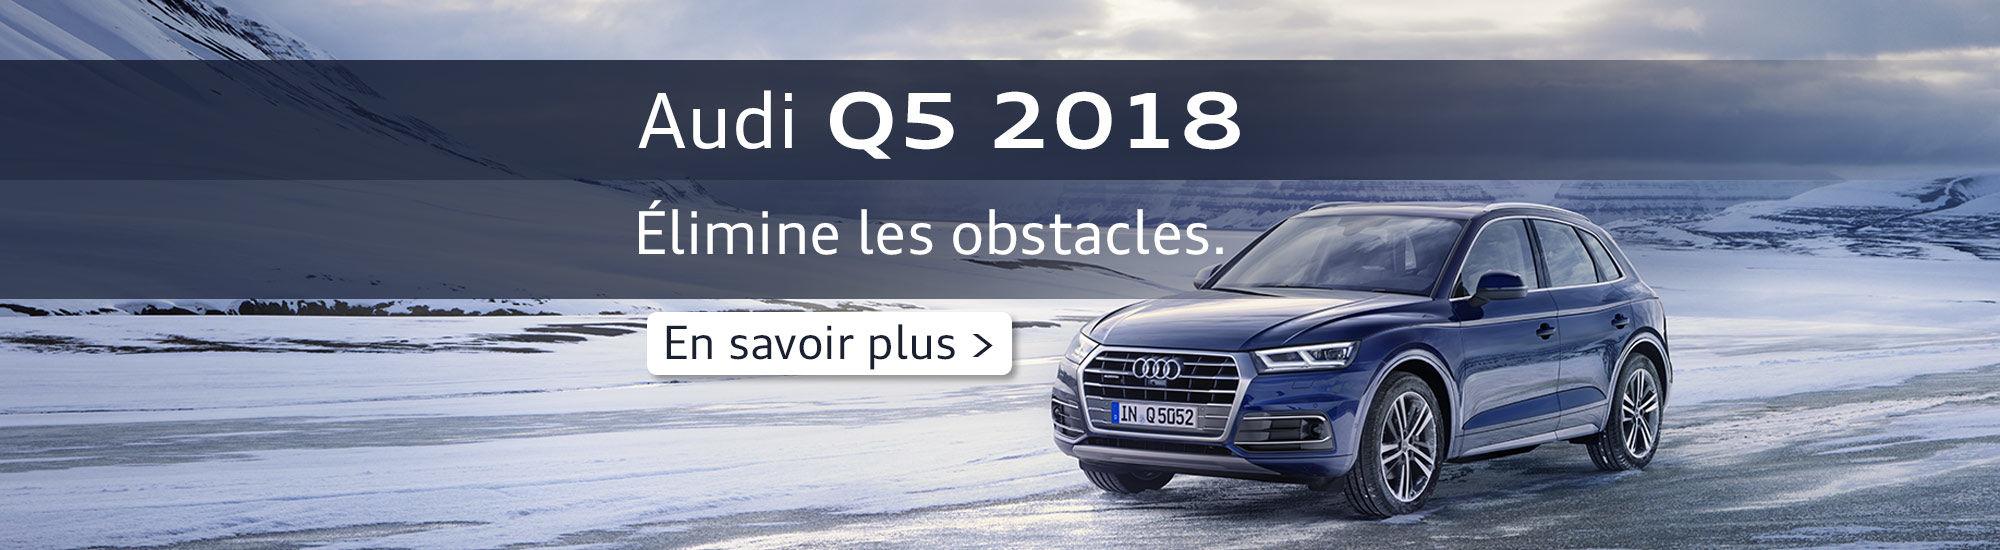 Q5 2018